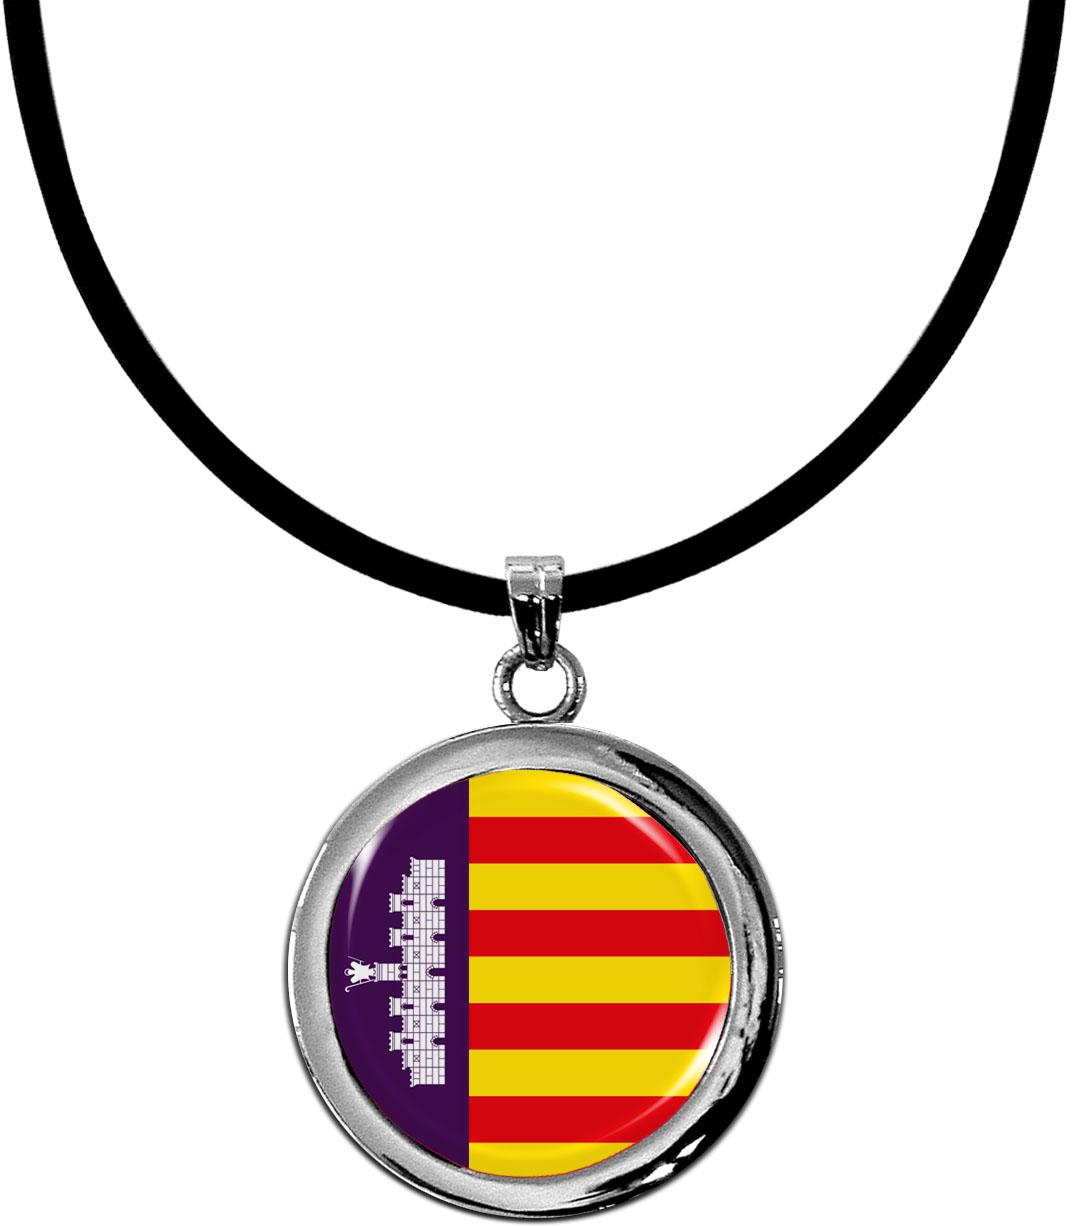 Kettenanhänger / Mallorca / Silikonband mit Silberverschluss